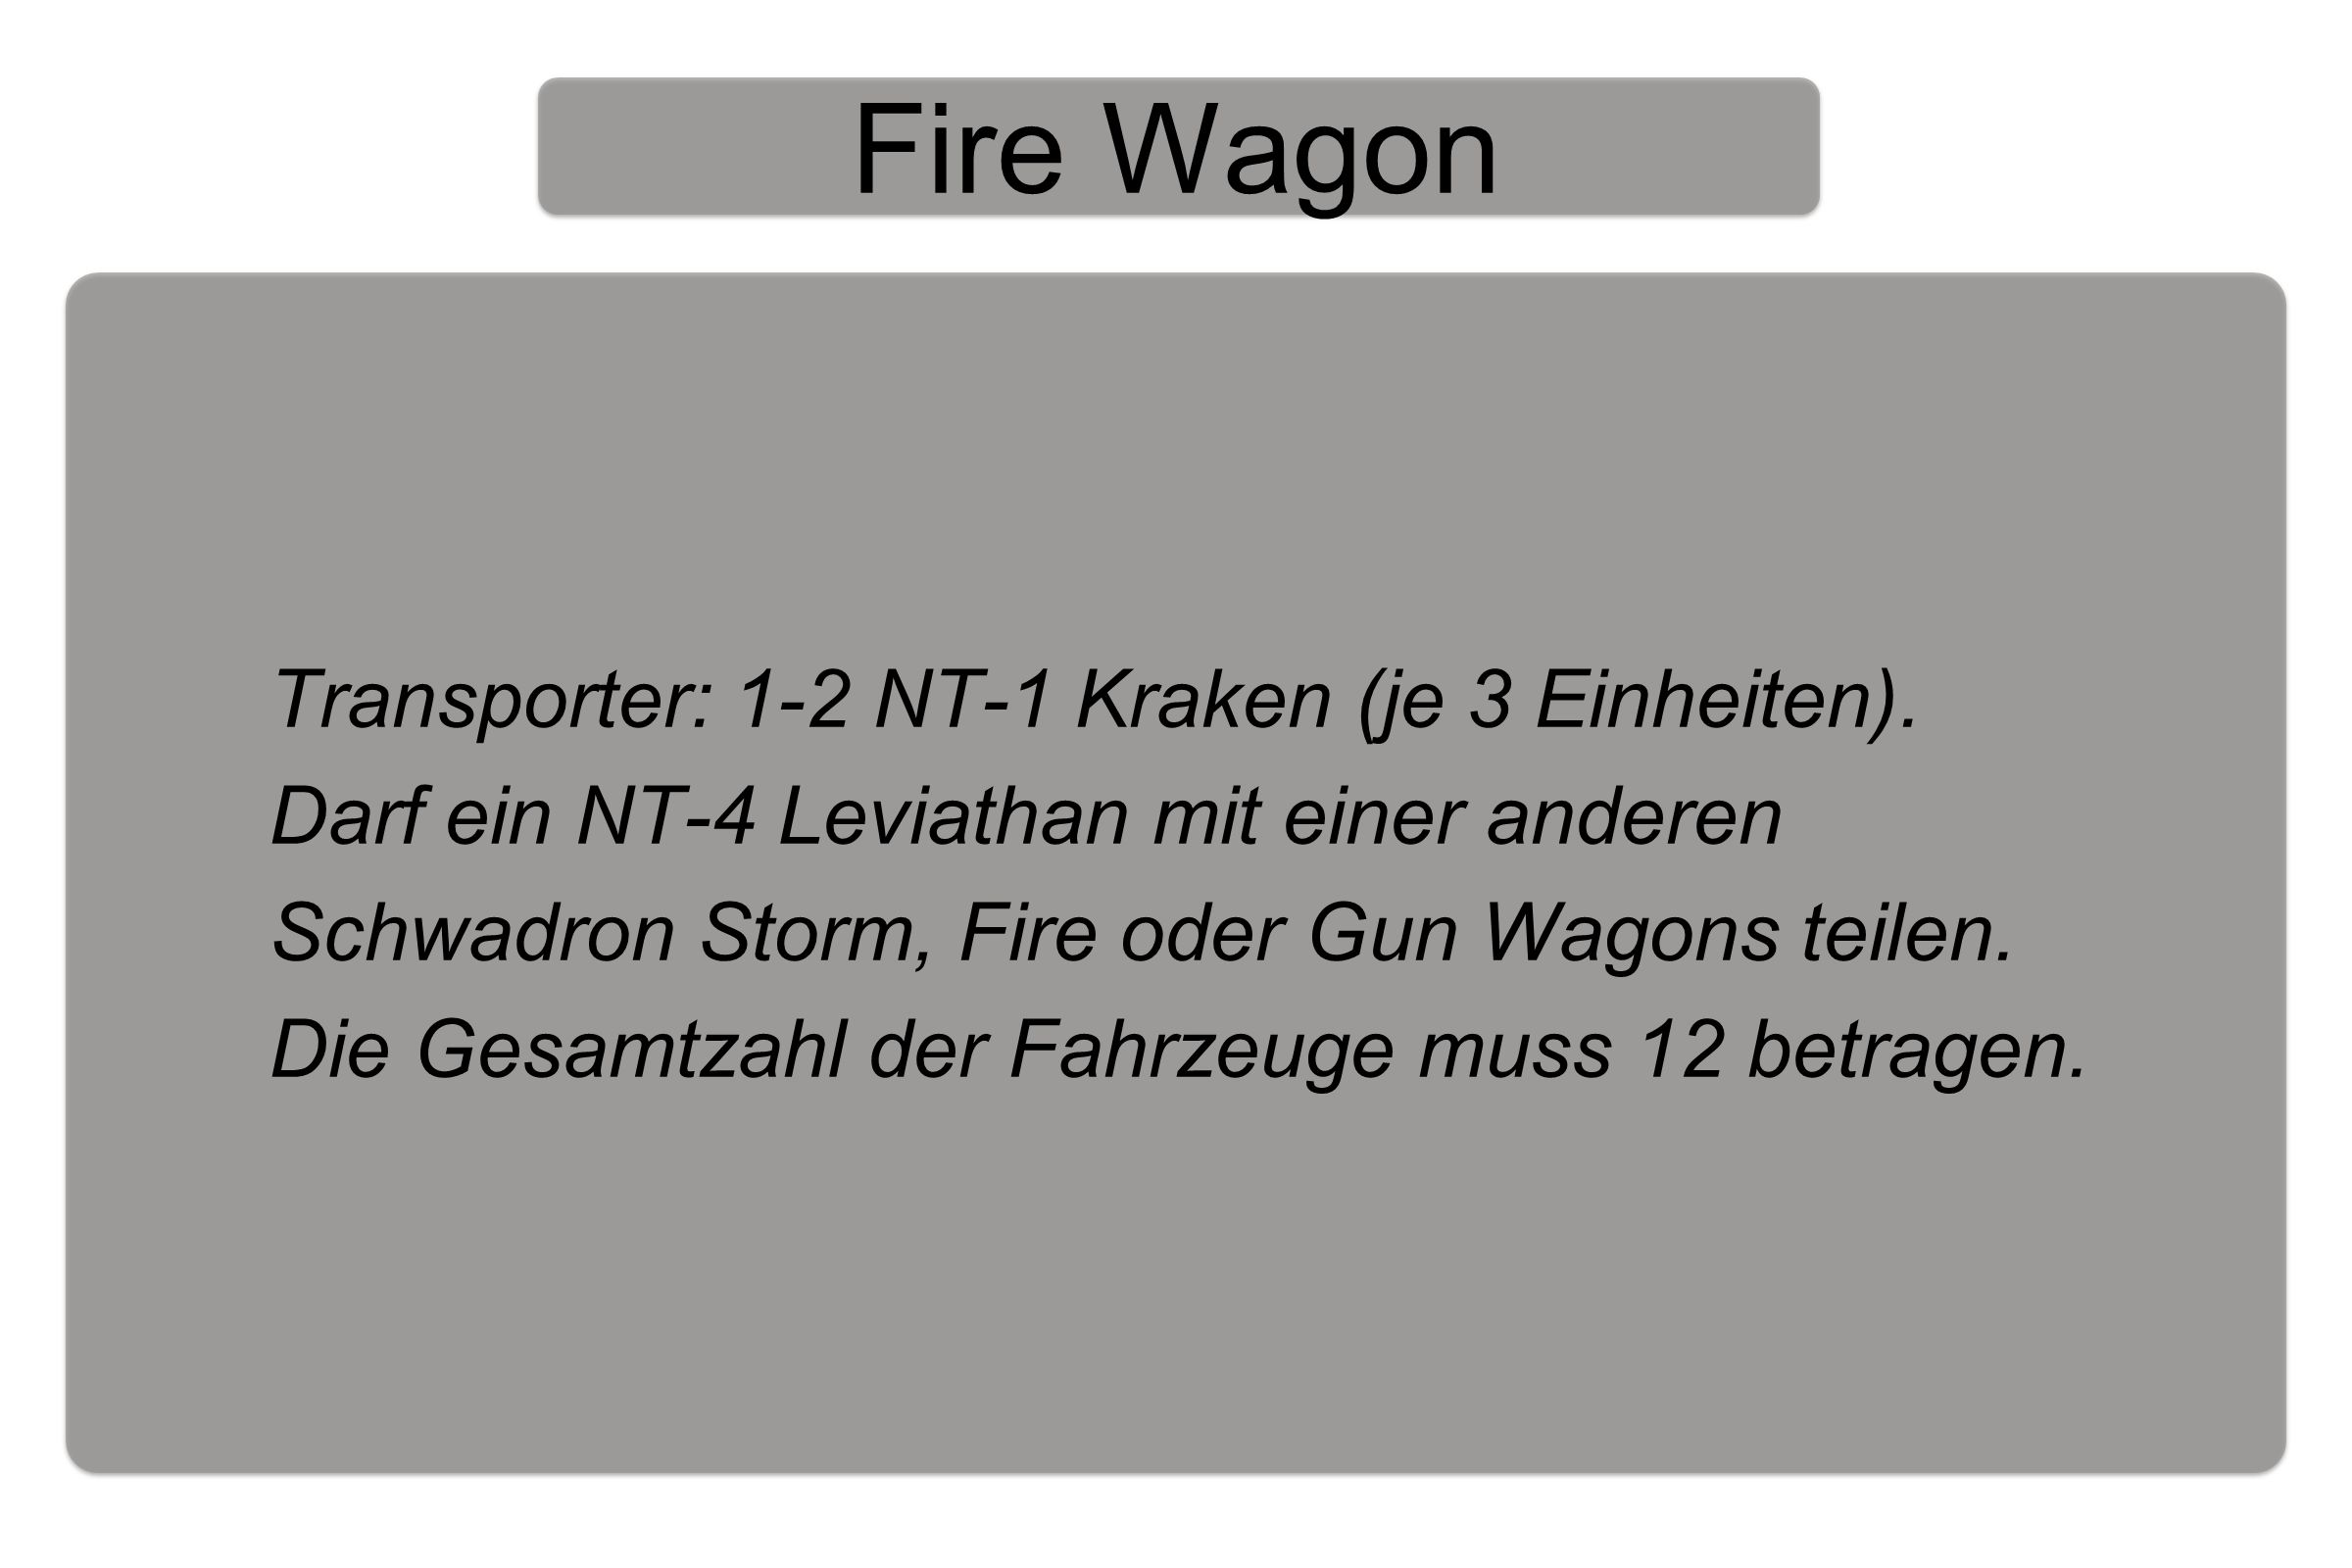 Fire Wagon Transporter: 1-2 NT-1 Kraken (je 3 Einheiten).